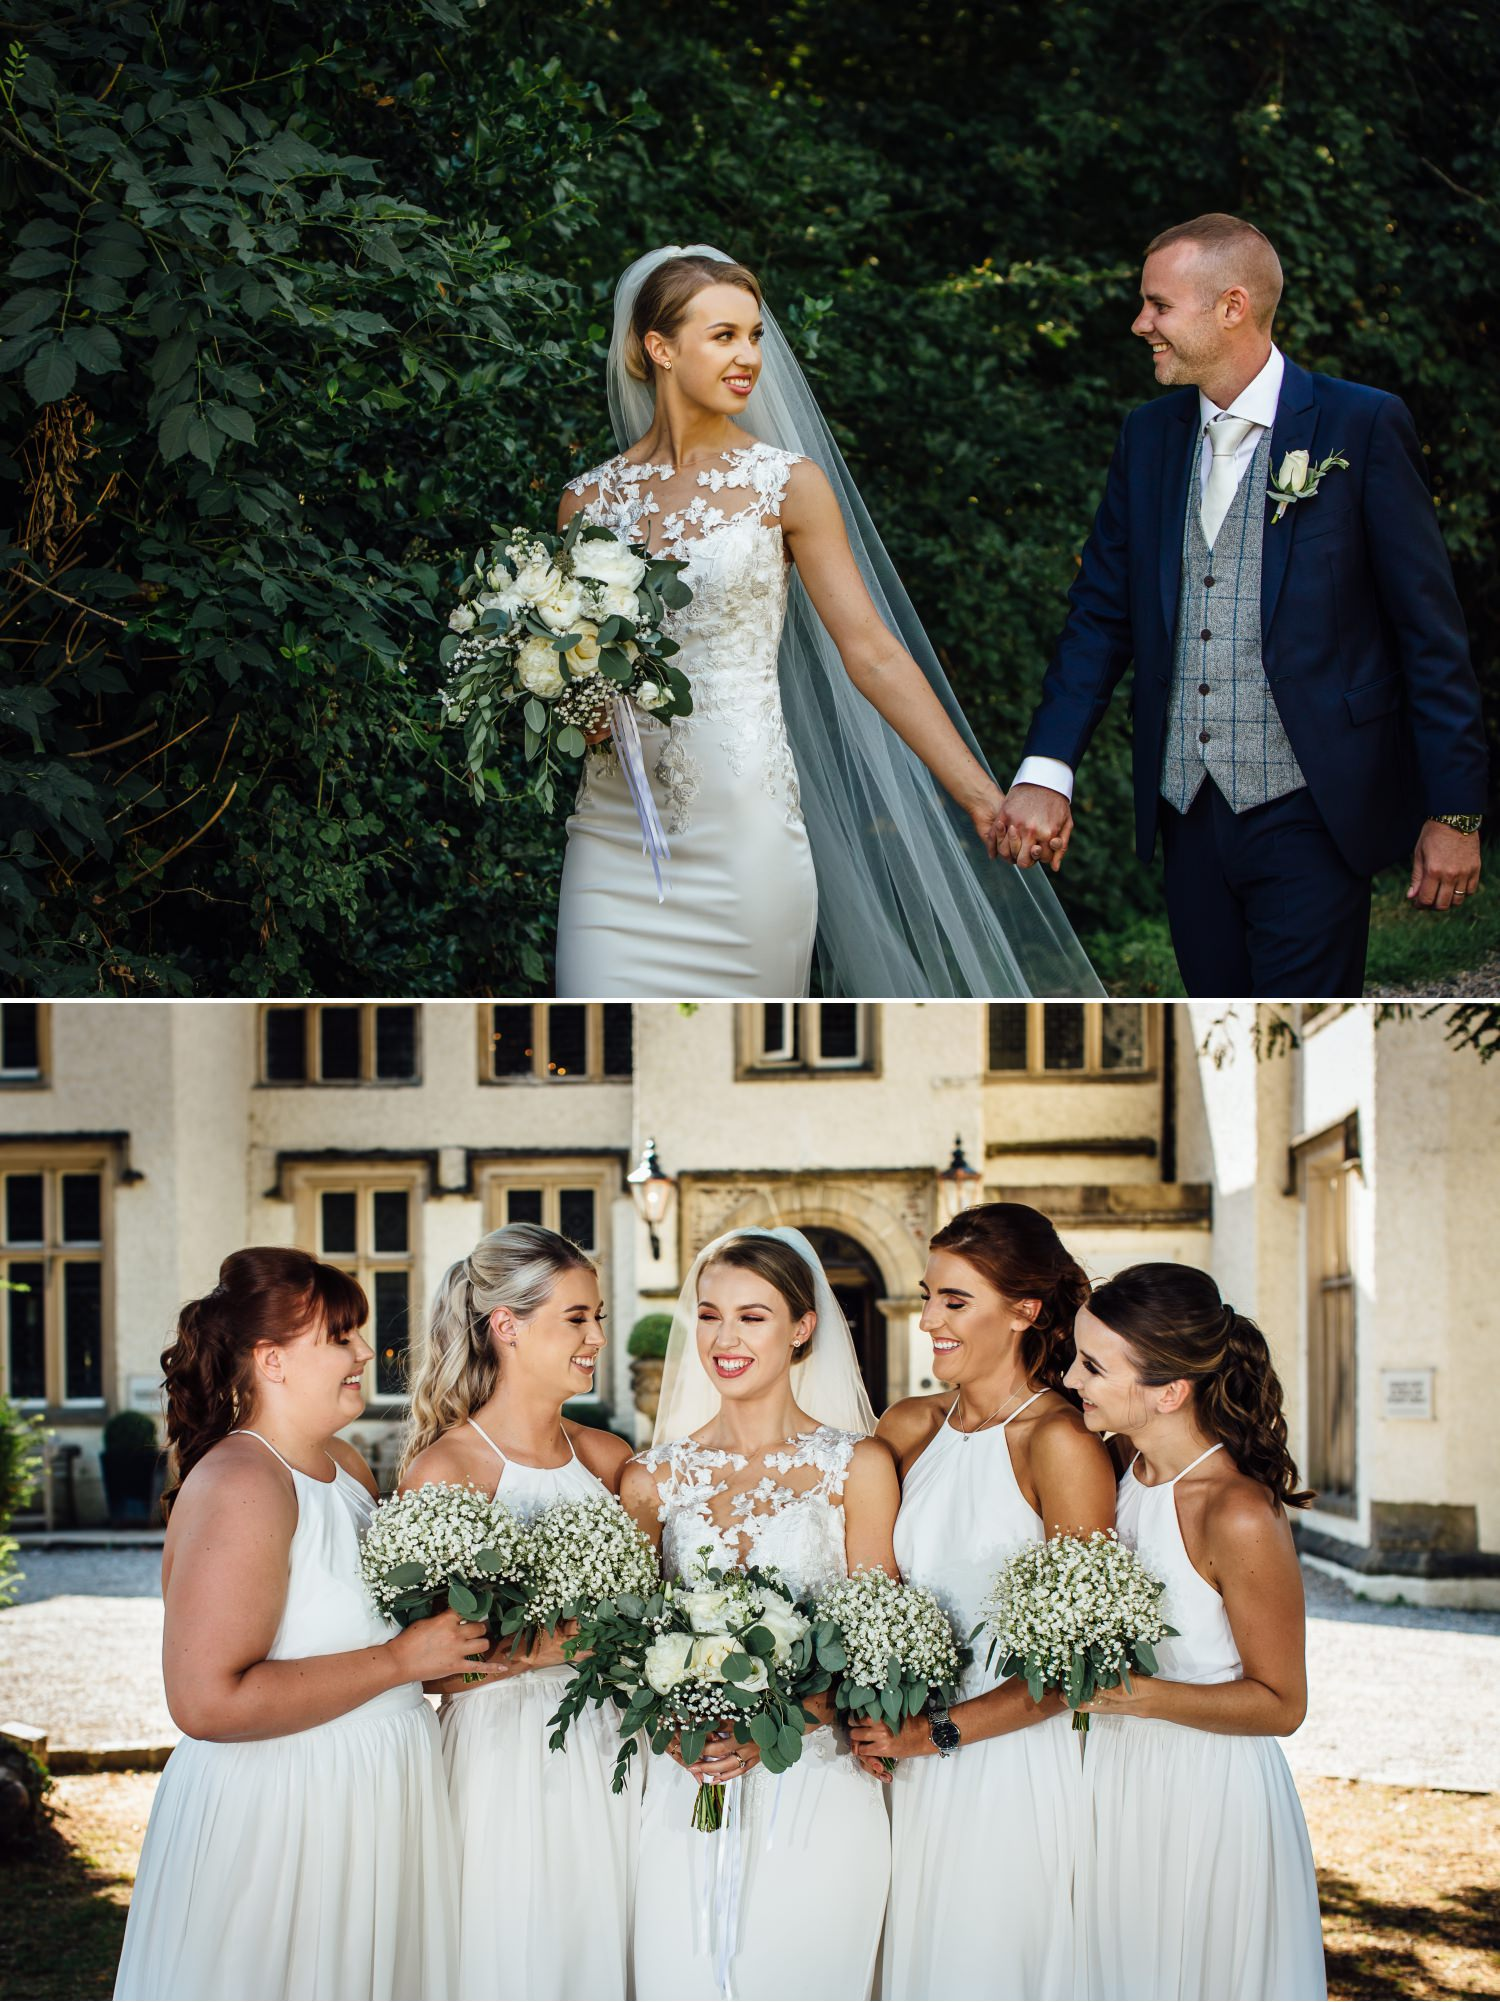 Wedding photography of bride and bridesmaids at Milton Hall, Lancashire